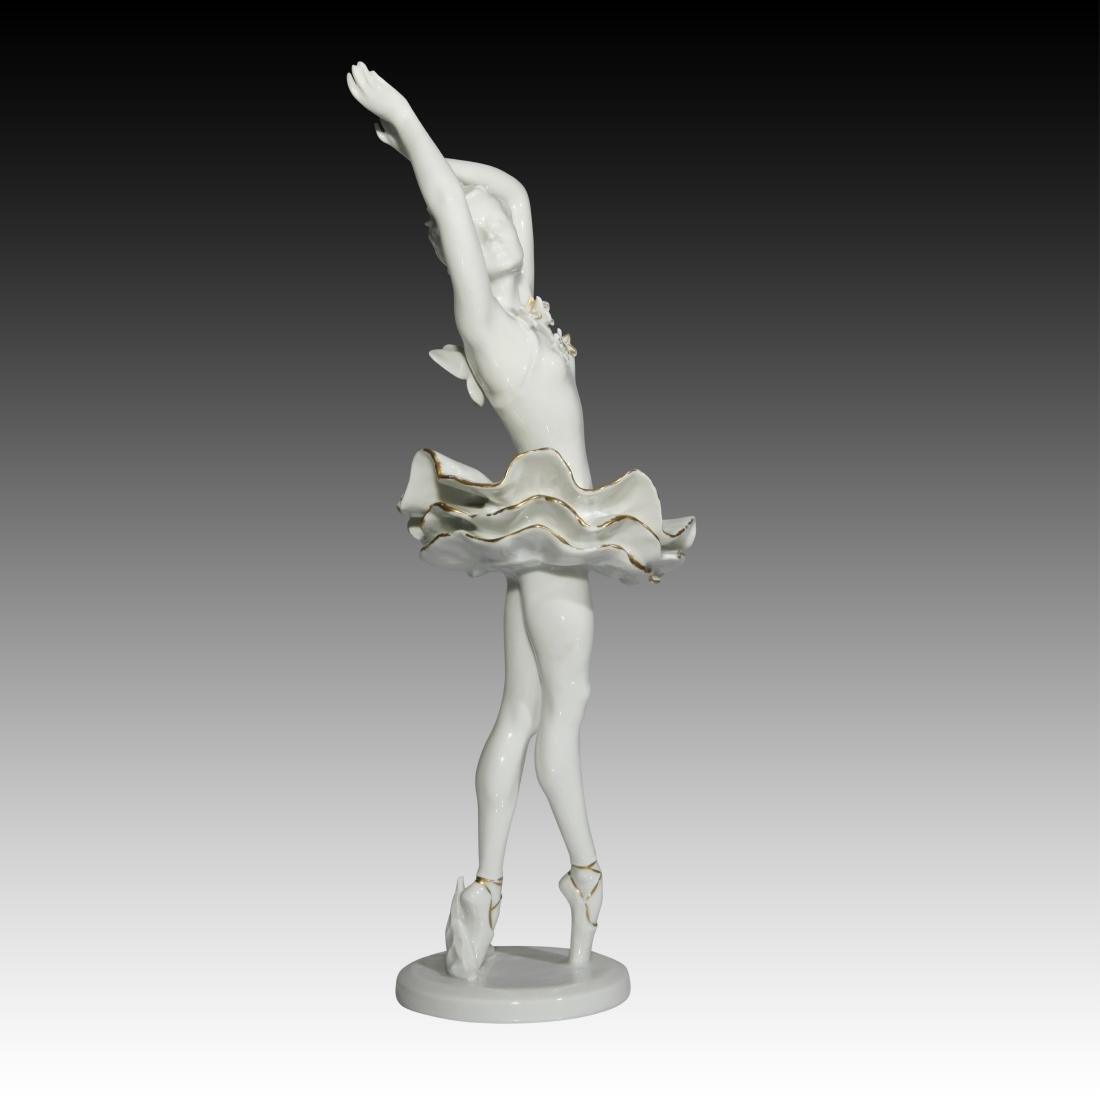 Rosenthal Female Ballerina Figurine